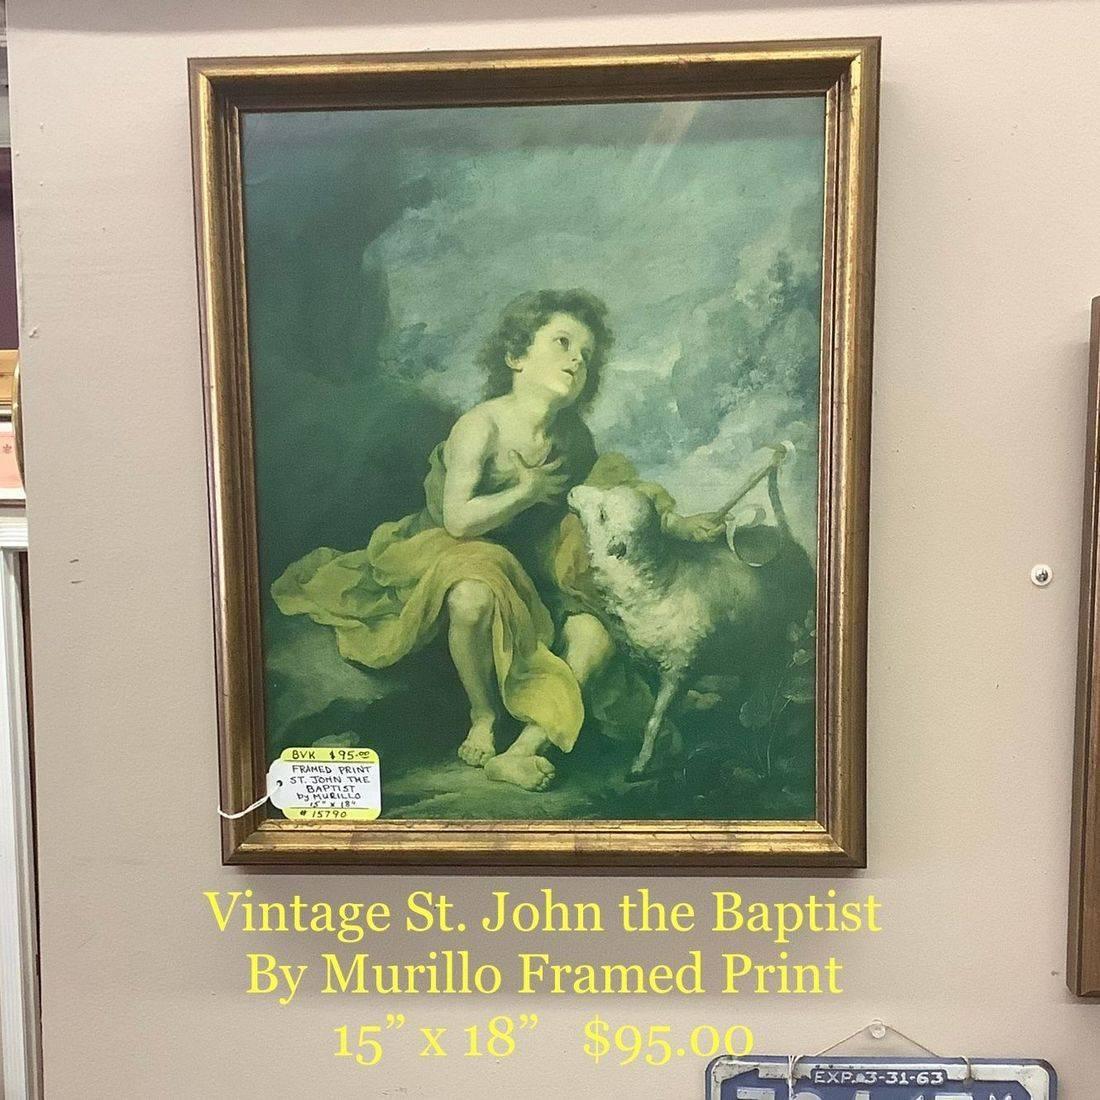 "Vintage St. John the Baptist by Murillo Framed Print  15"" x 18""   $95.00"